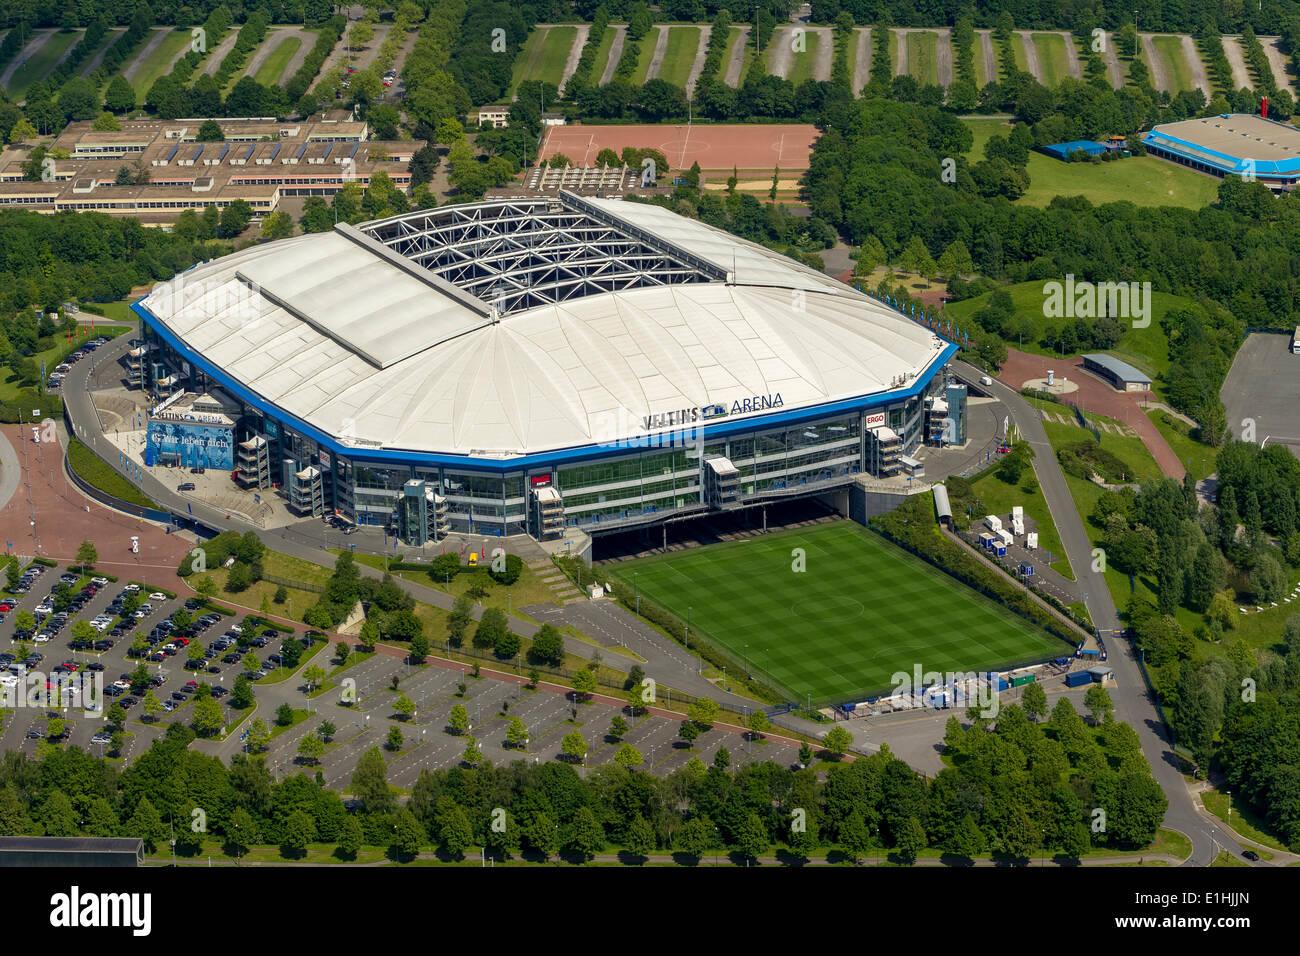 Gelsenkirchen Arena